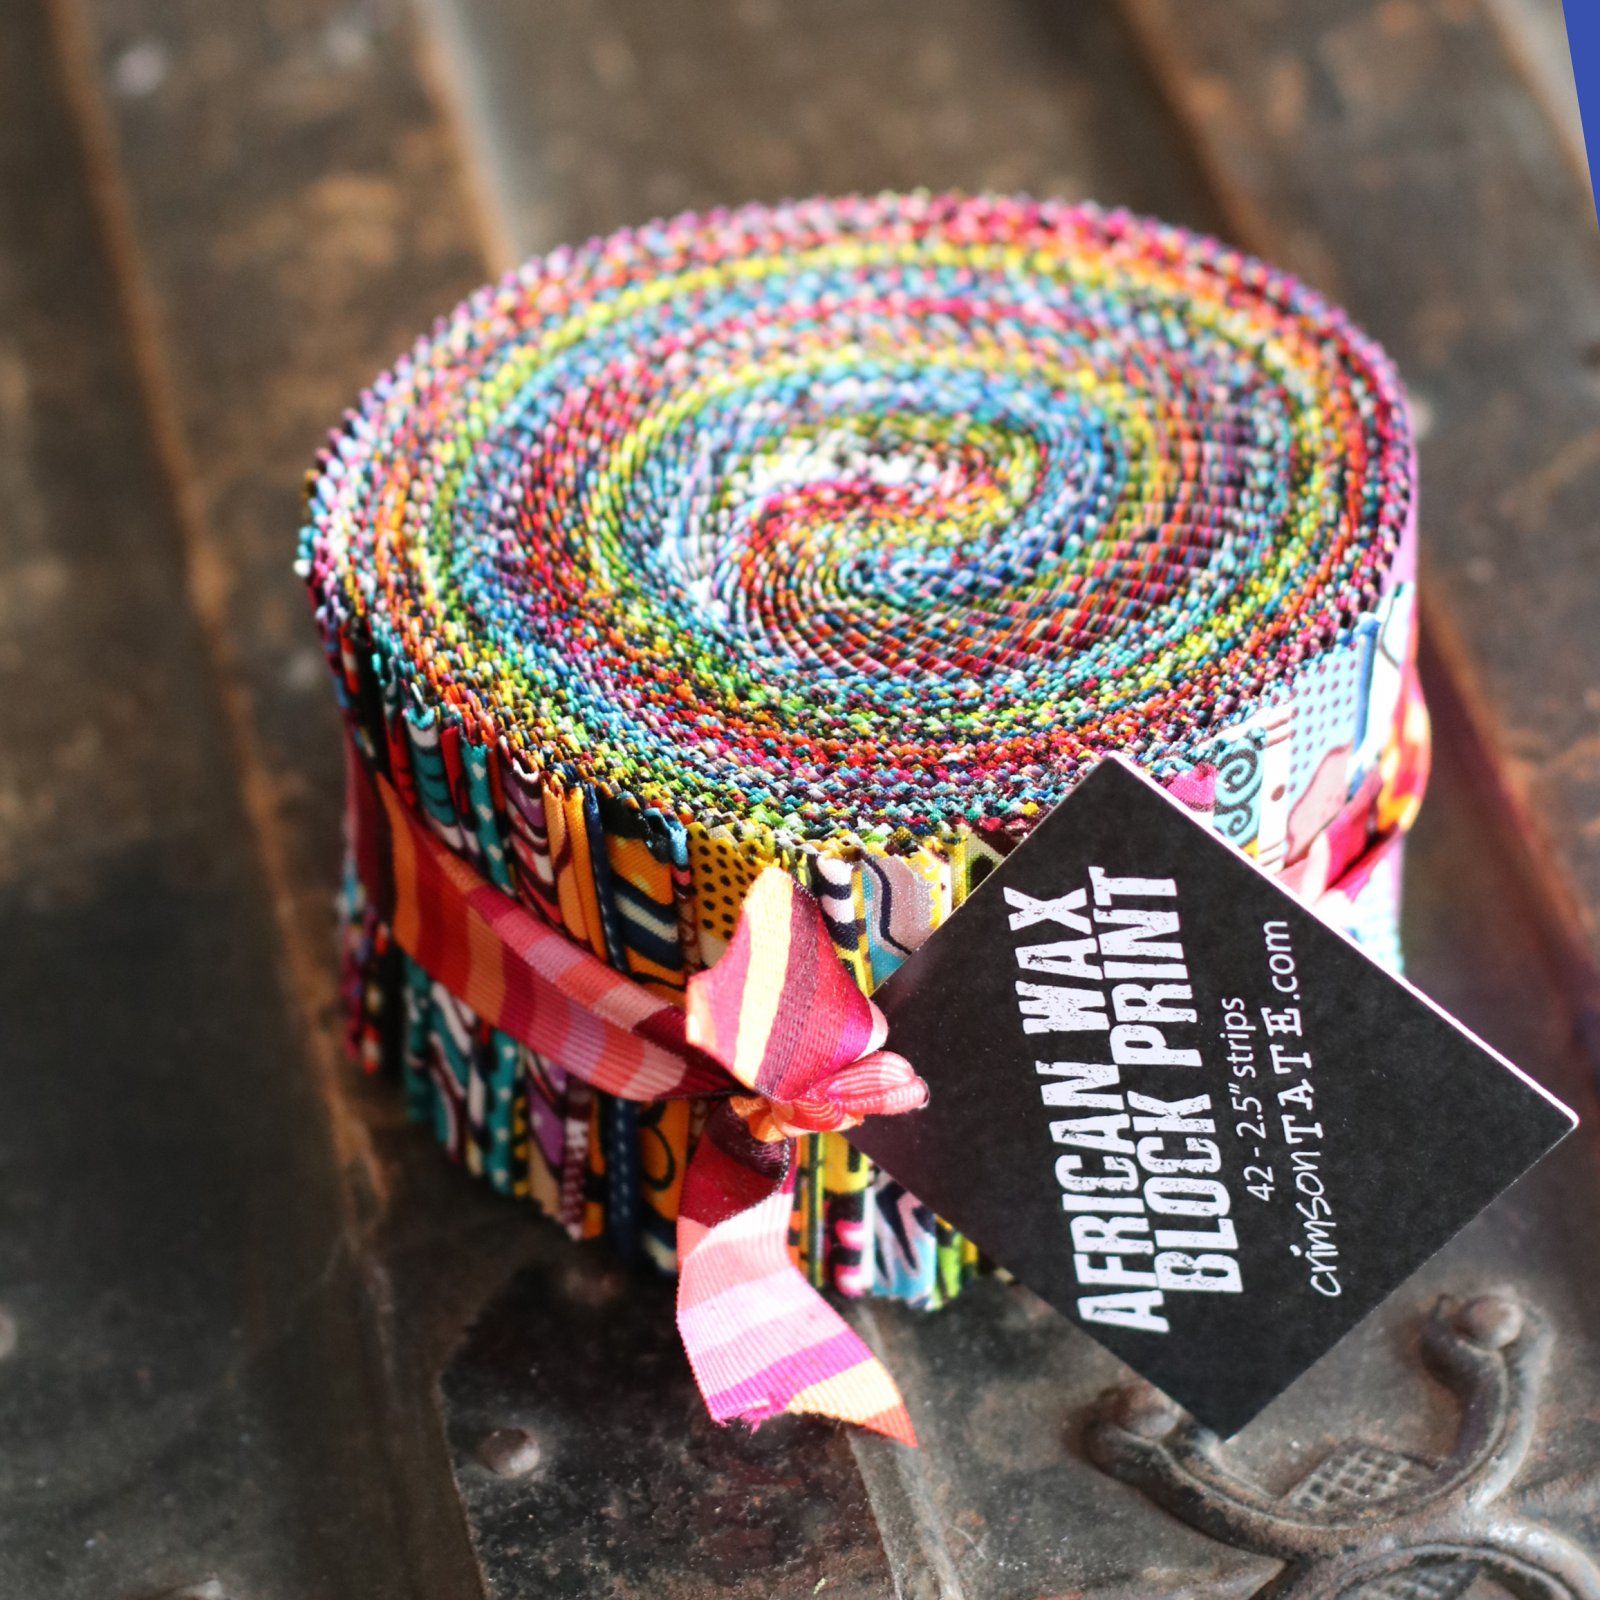 African Wax Block Print Jellyroll - (42) 2.5 strips